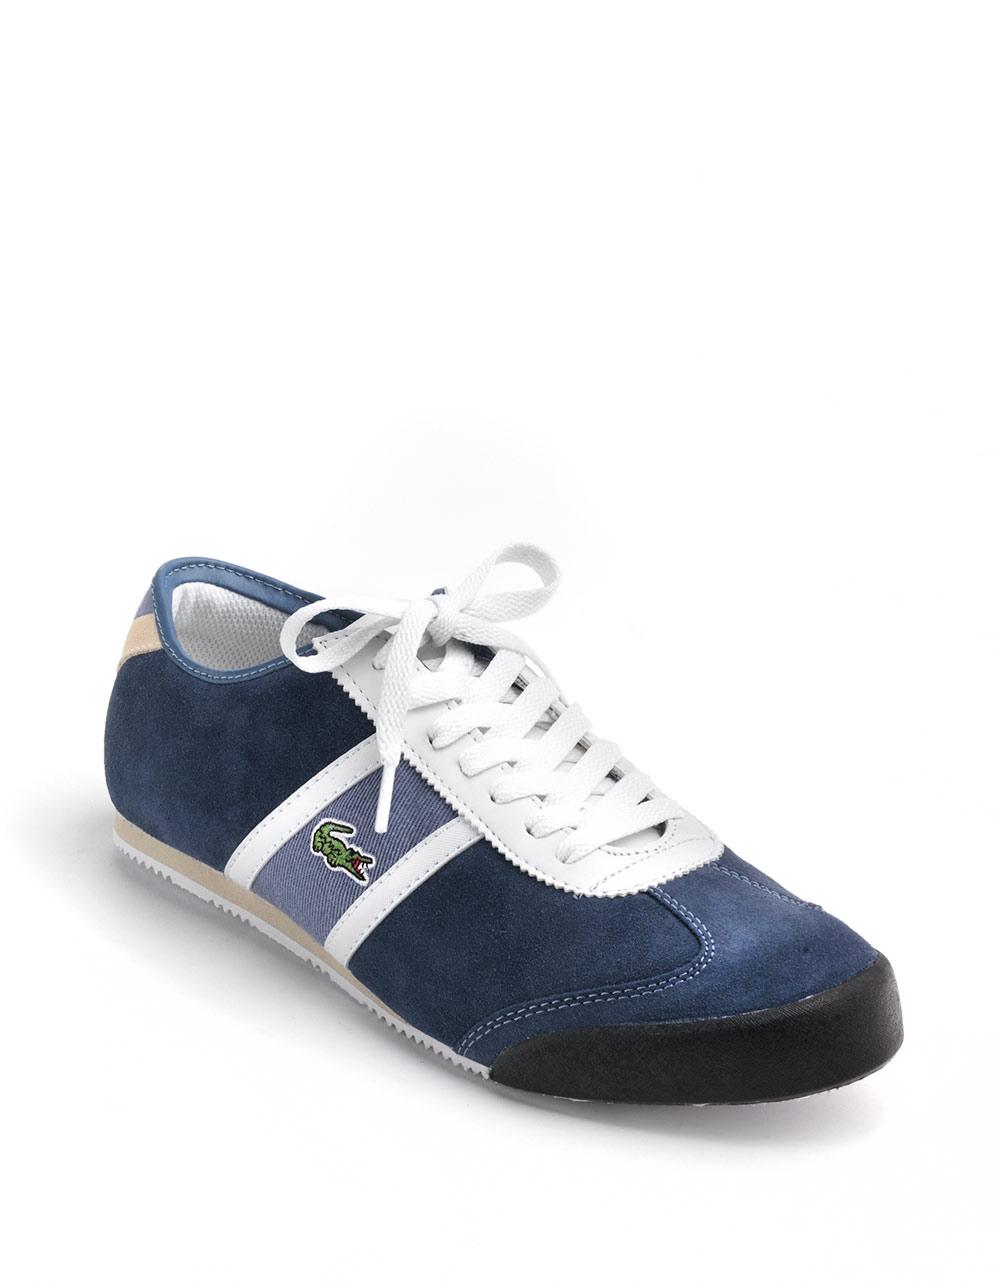 Lacoste Tourelle Sneakers in Blue for Men   Lyst